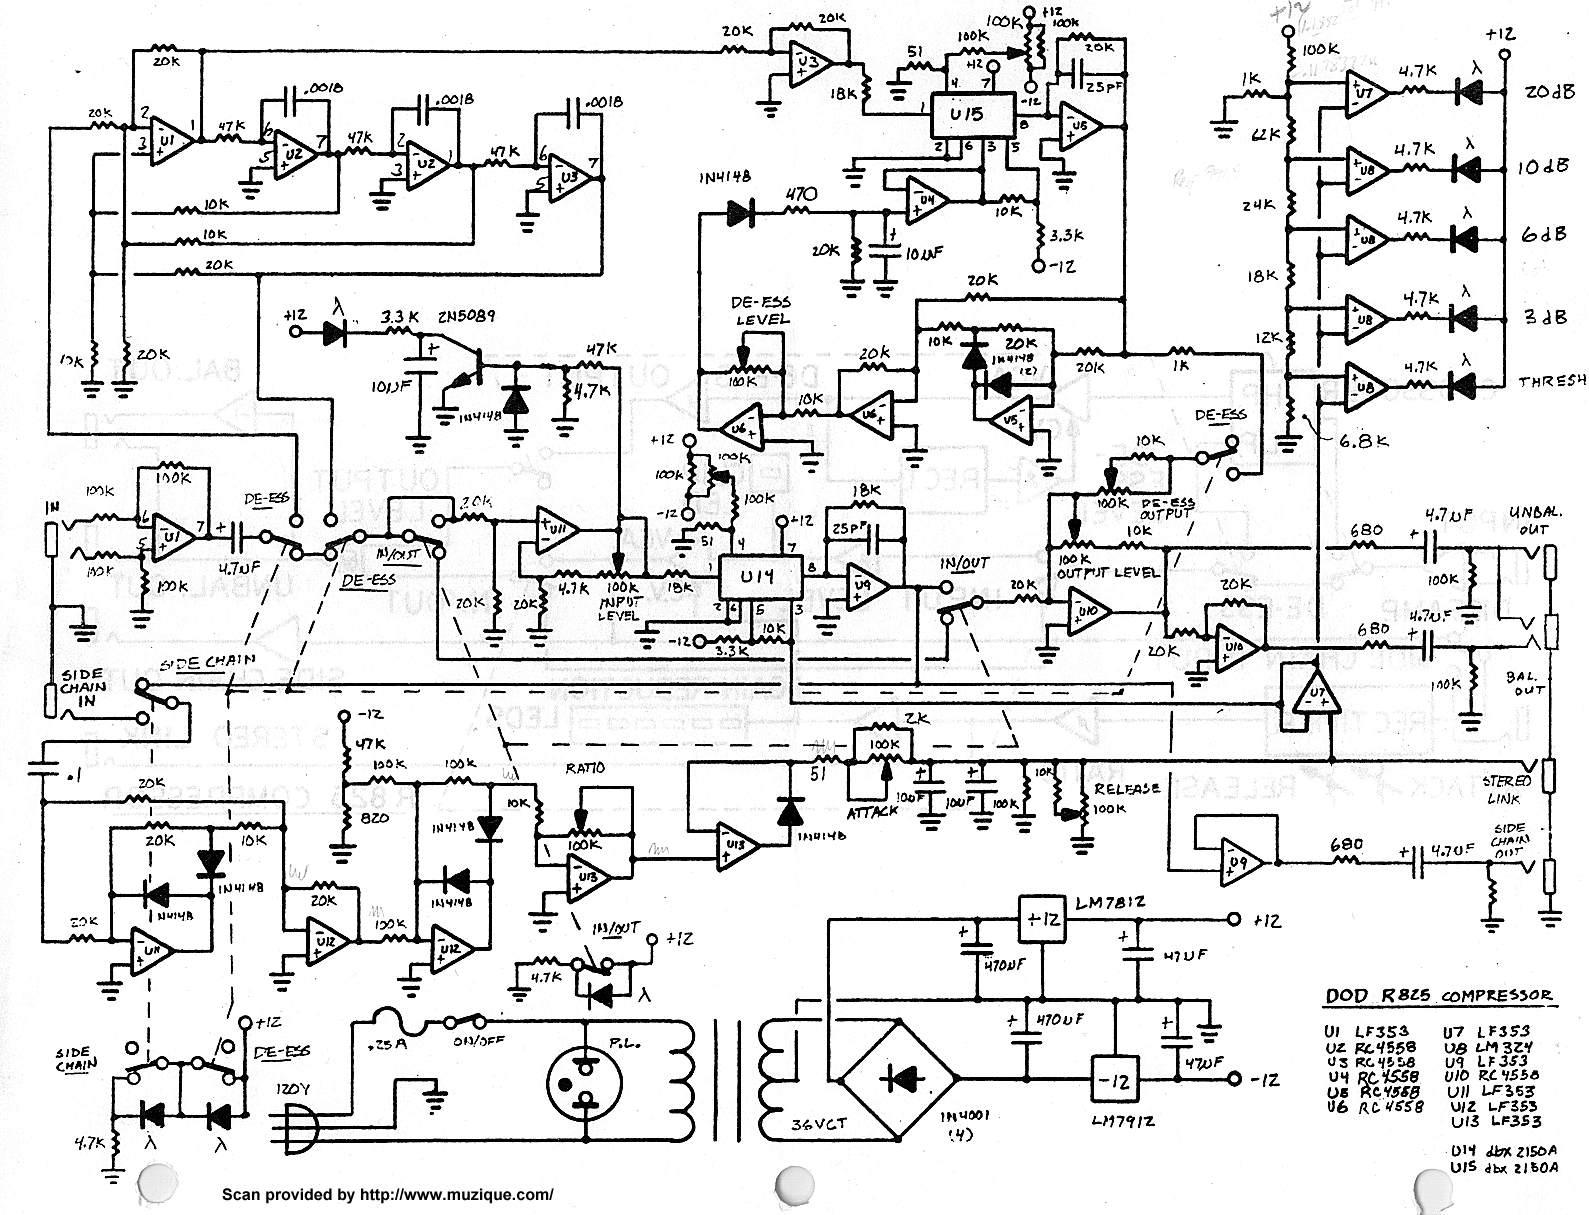 Index of /diy/Schematics/Compressors Gates and Limiters